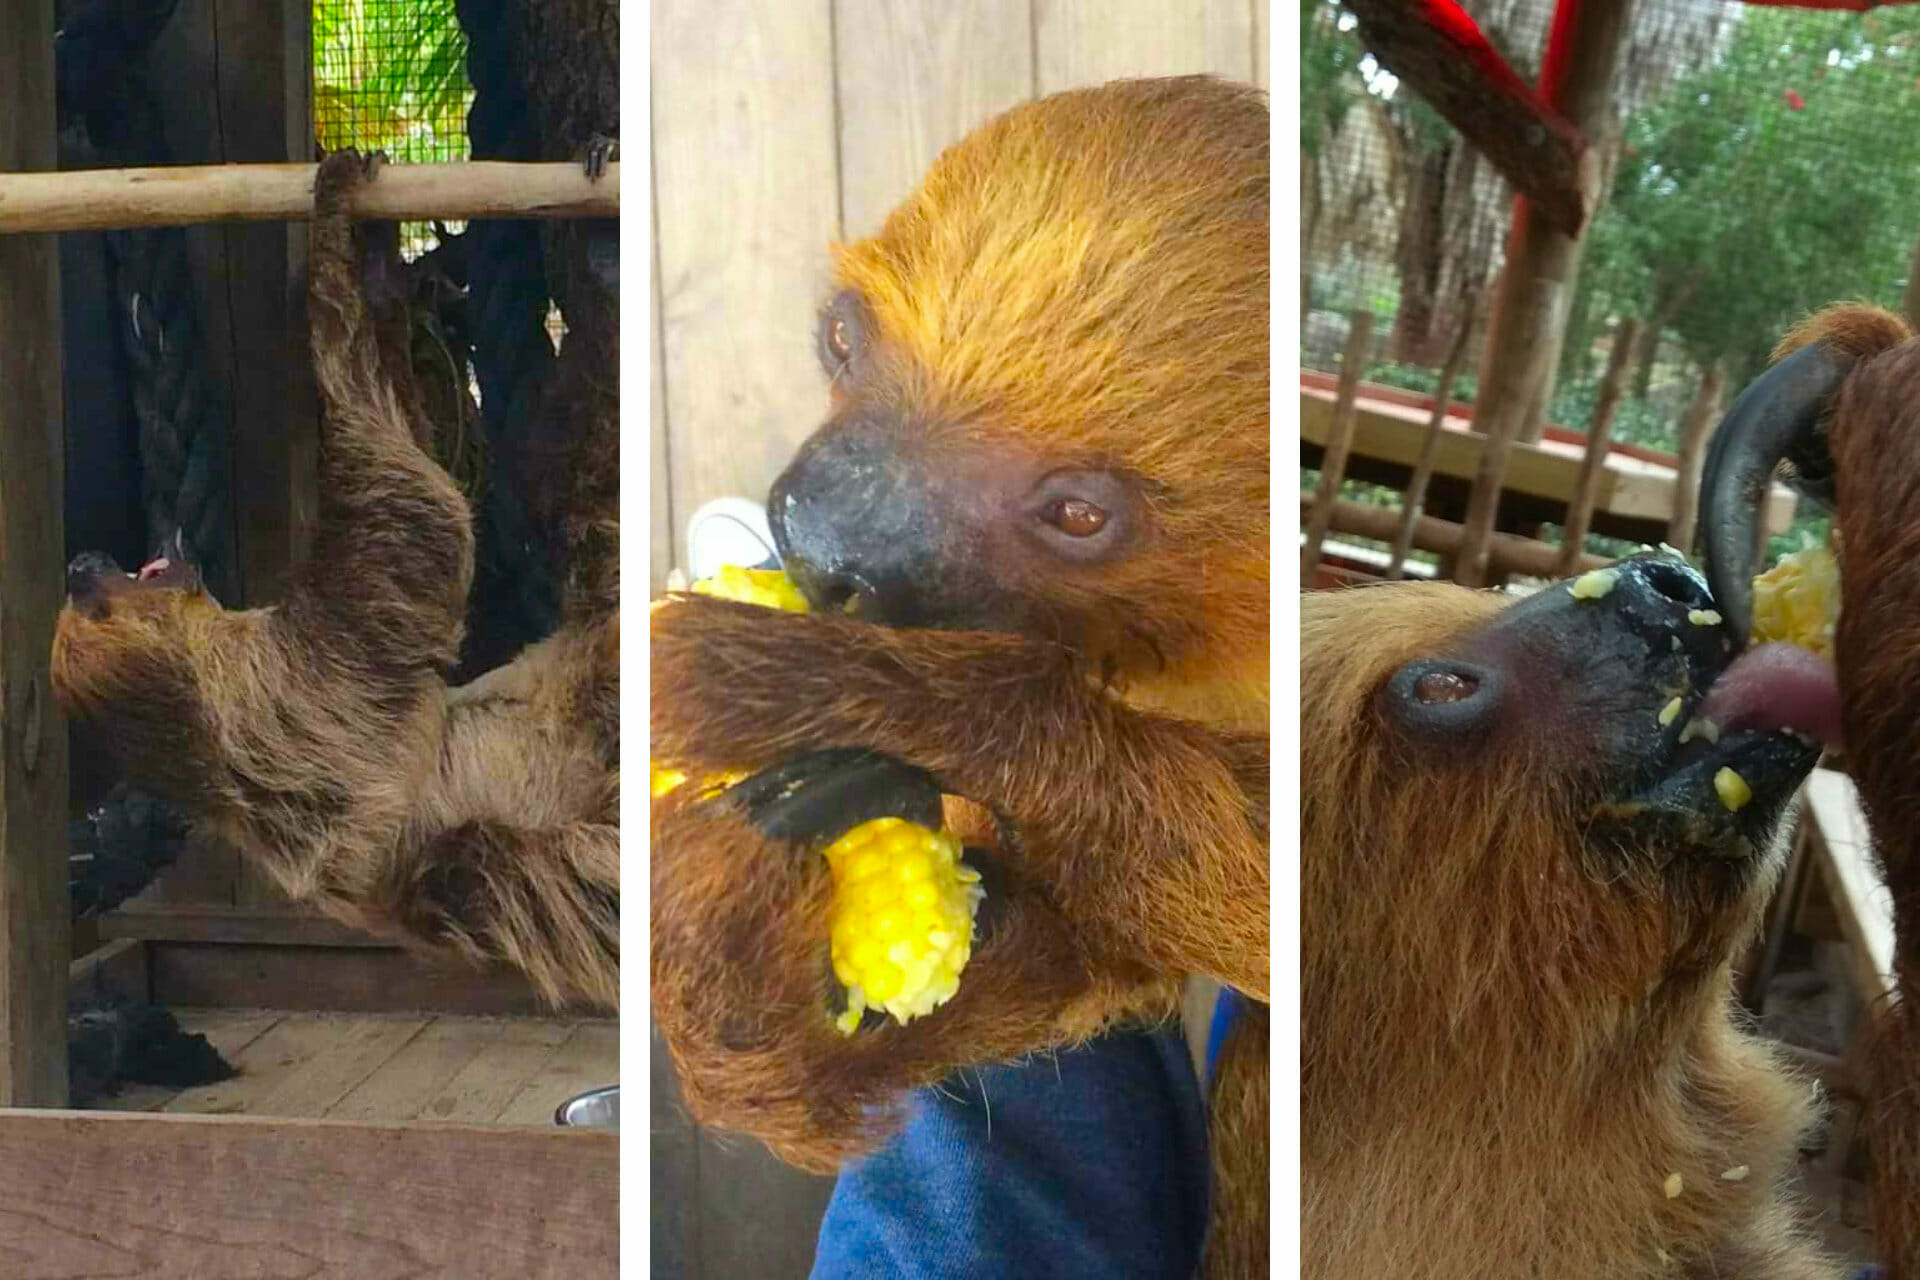 Wild Florida VIP Sloth Experience Review (+ Adorable Pics!) via @allamericanatlas